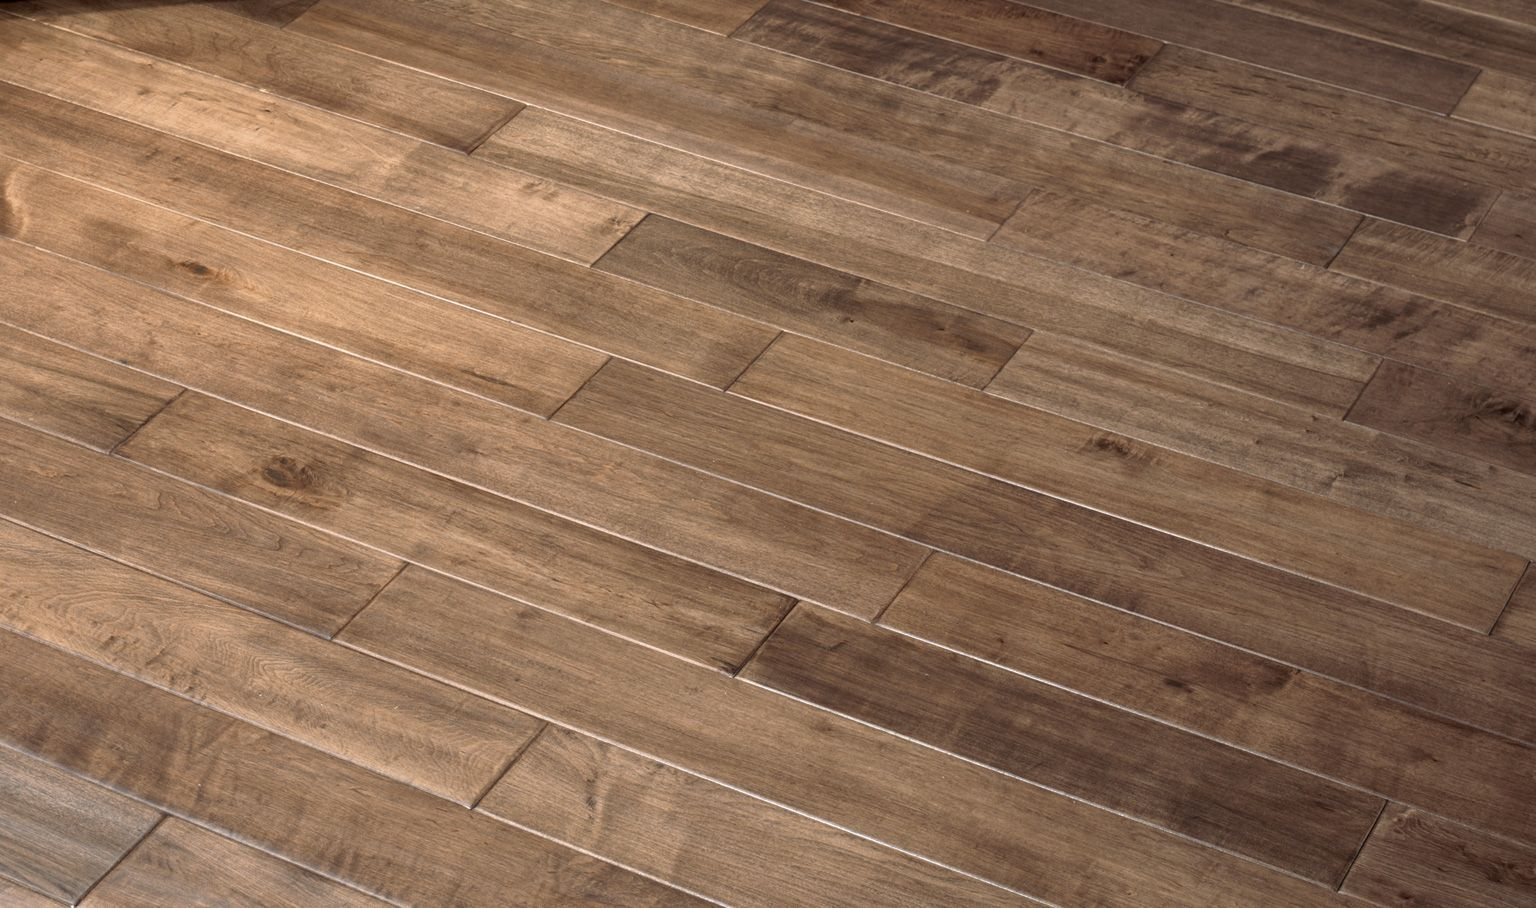 Antique Medium Brown Hardwood Floors Maple Hardwood Flooring